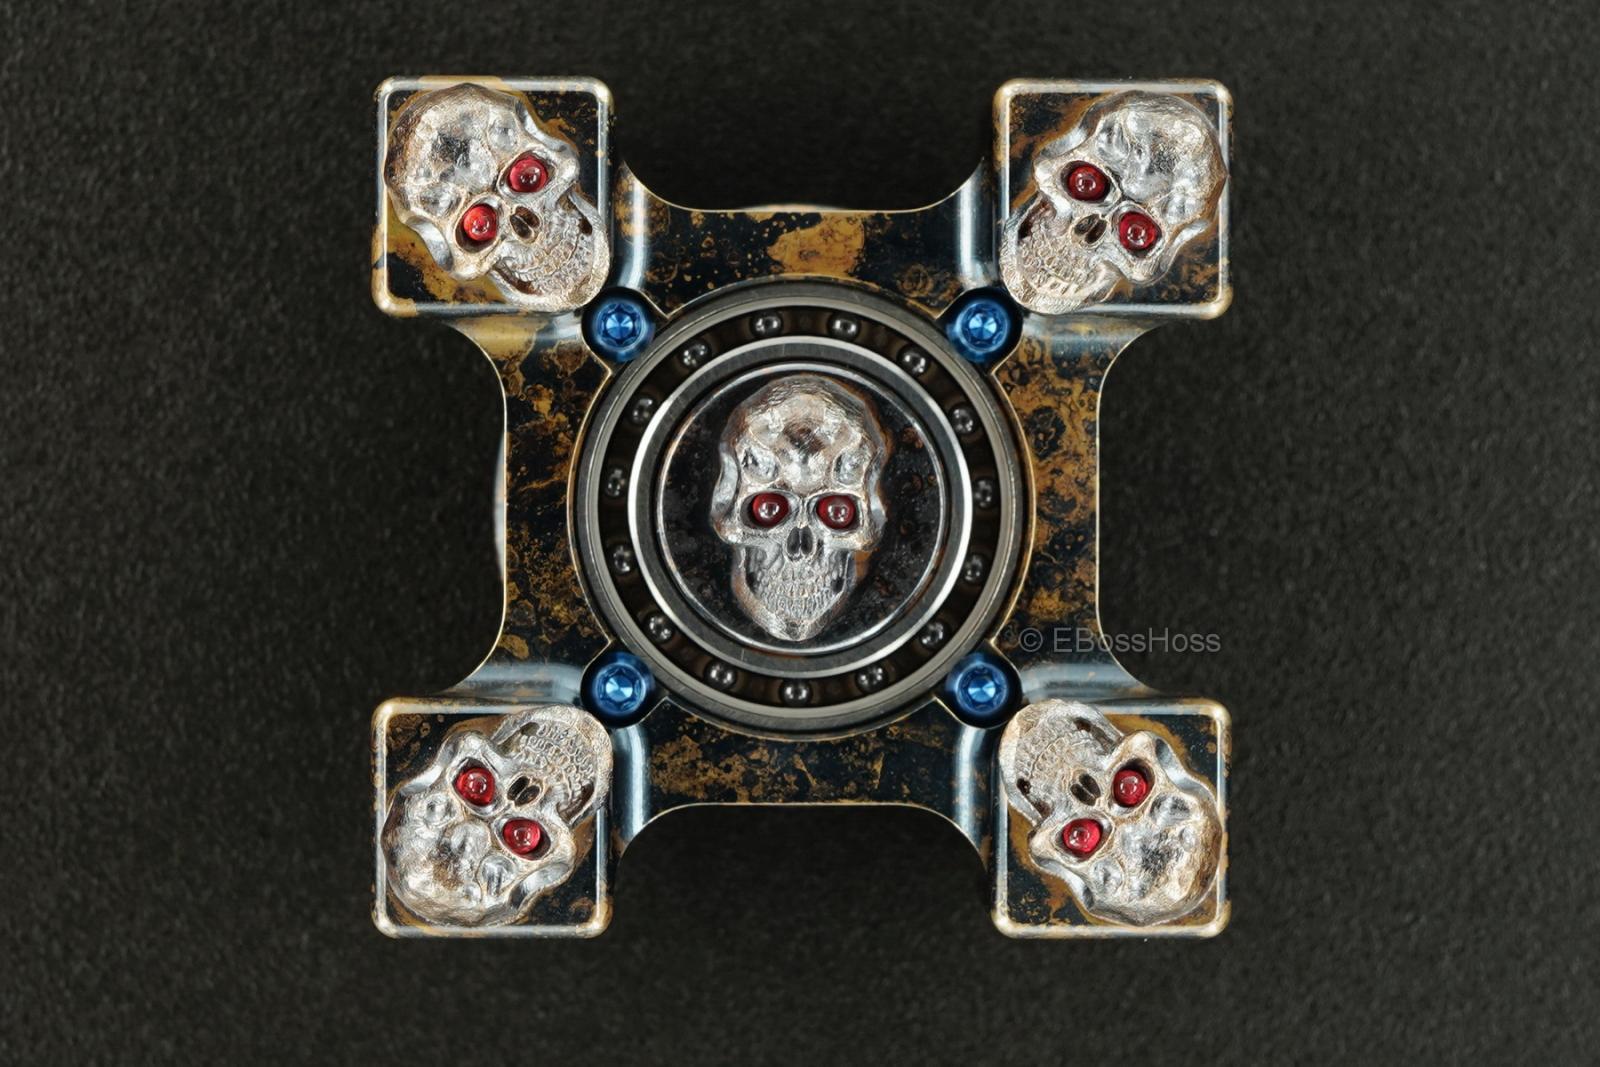 Steel Flame Derrick Obatake -ONE- Custom XL Darkness Sledge Ring Spin